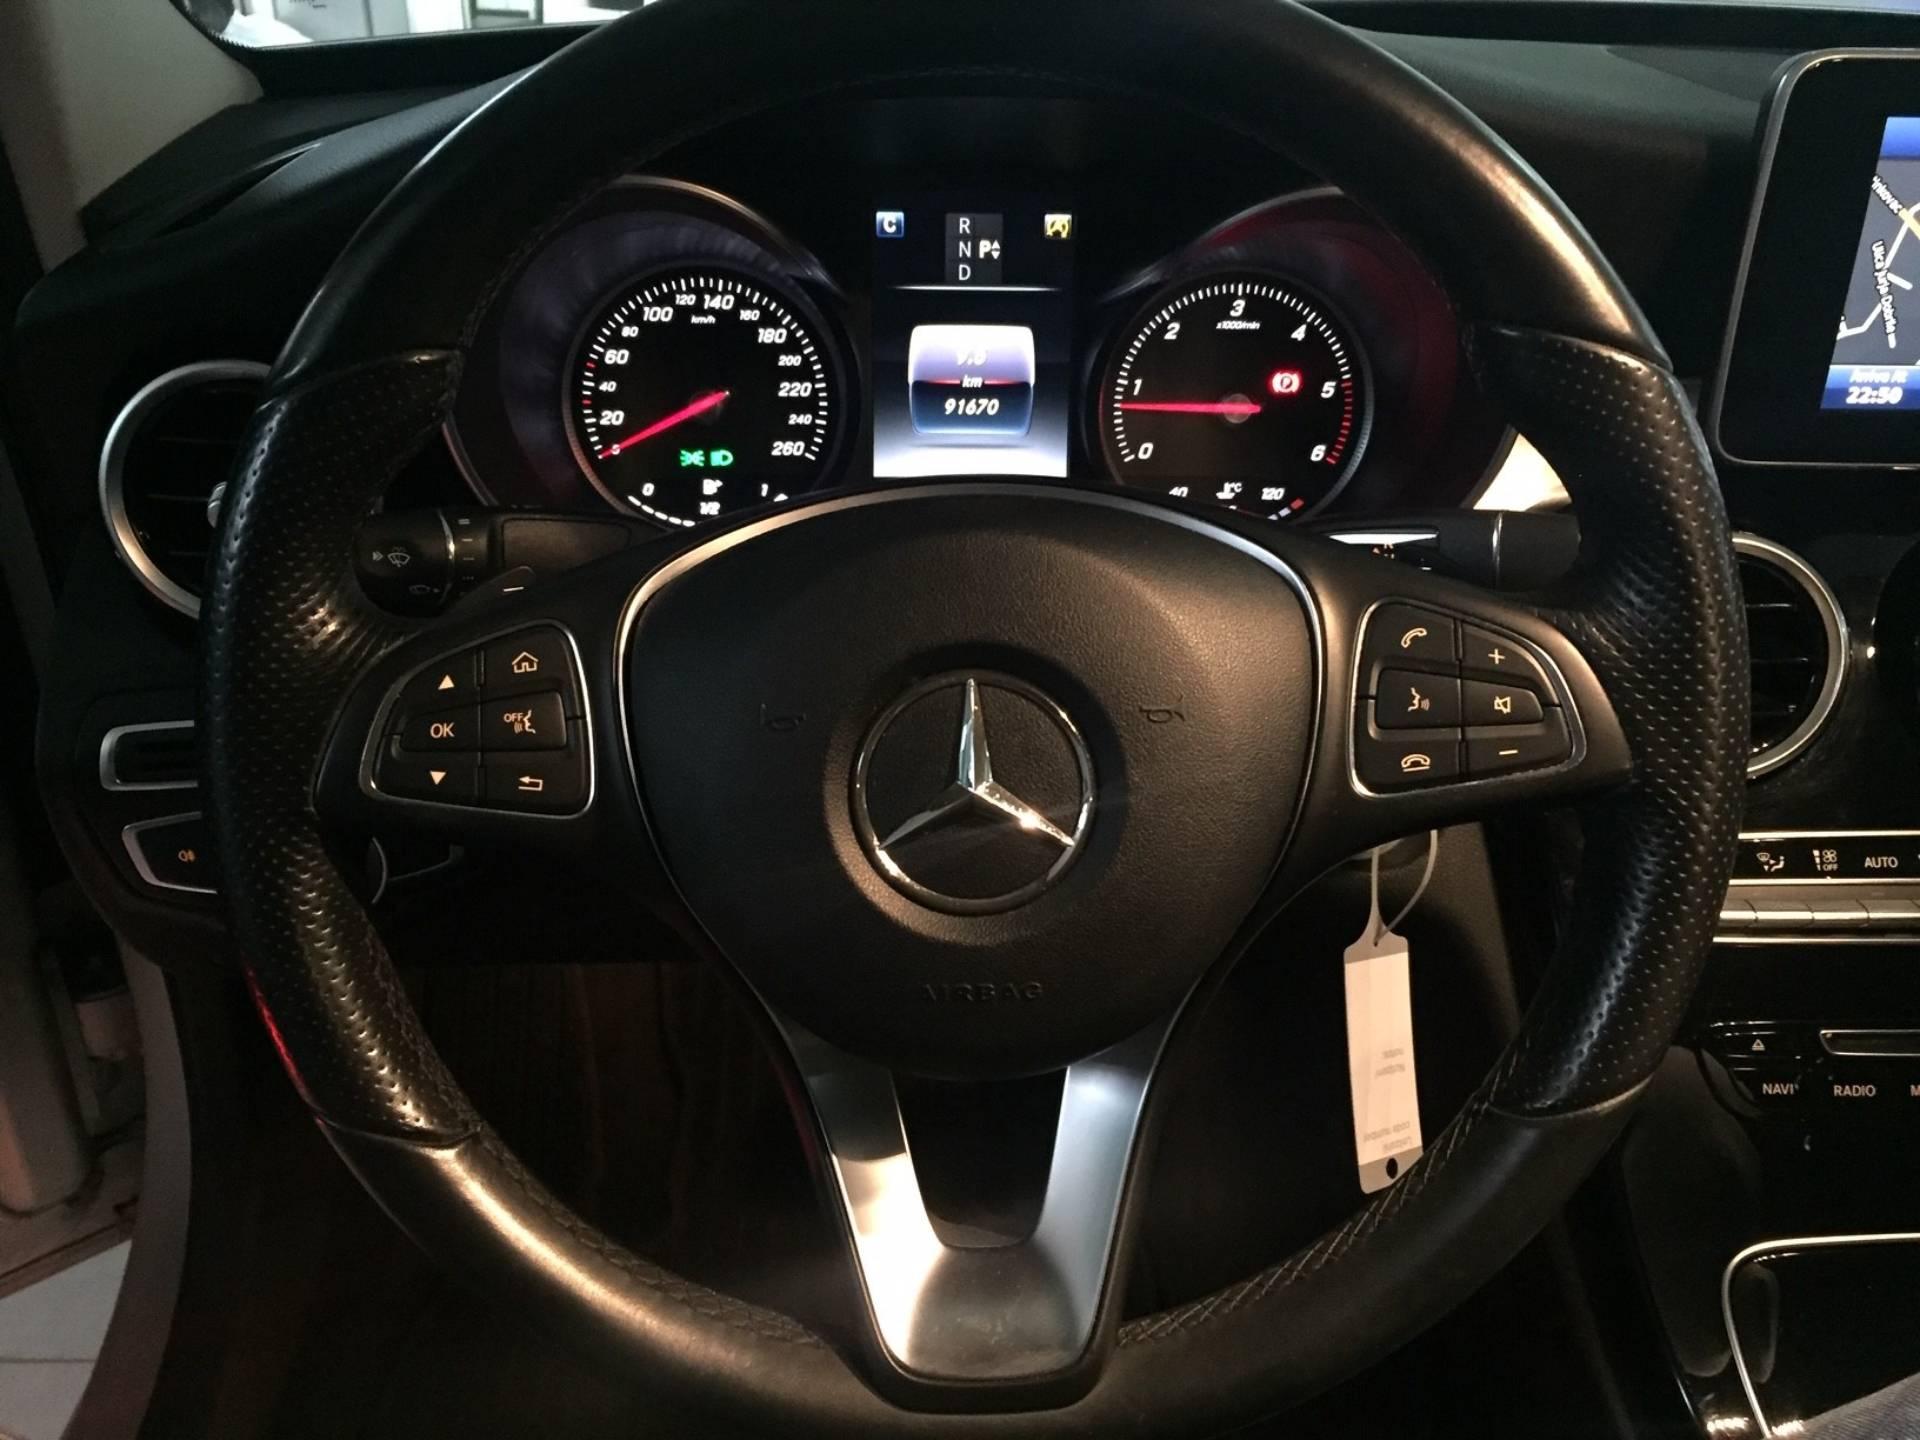 Mercedes-Benz C 220 d AVANTGARDE 7G